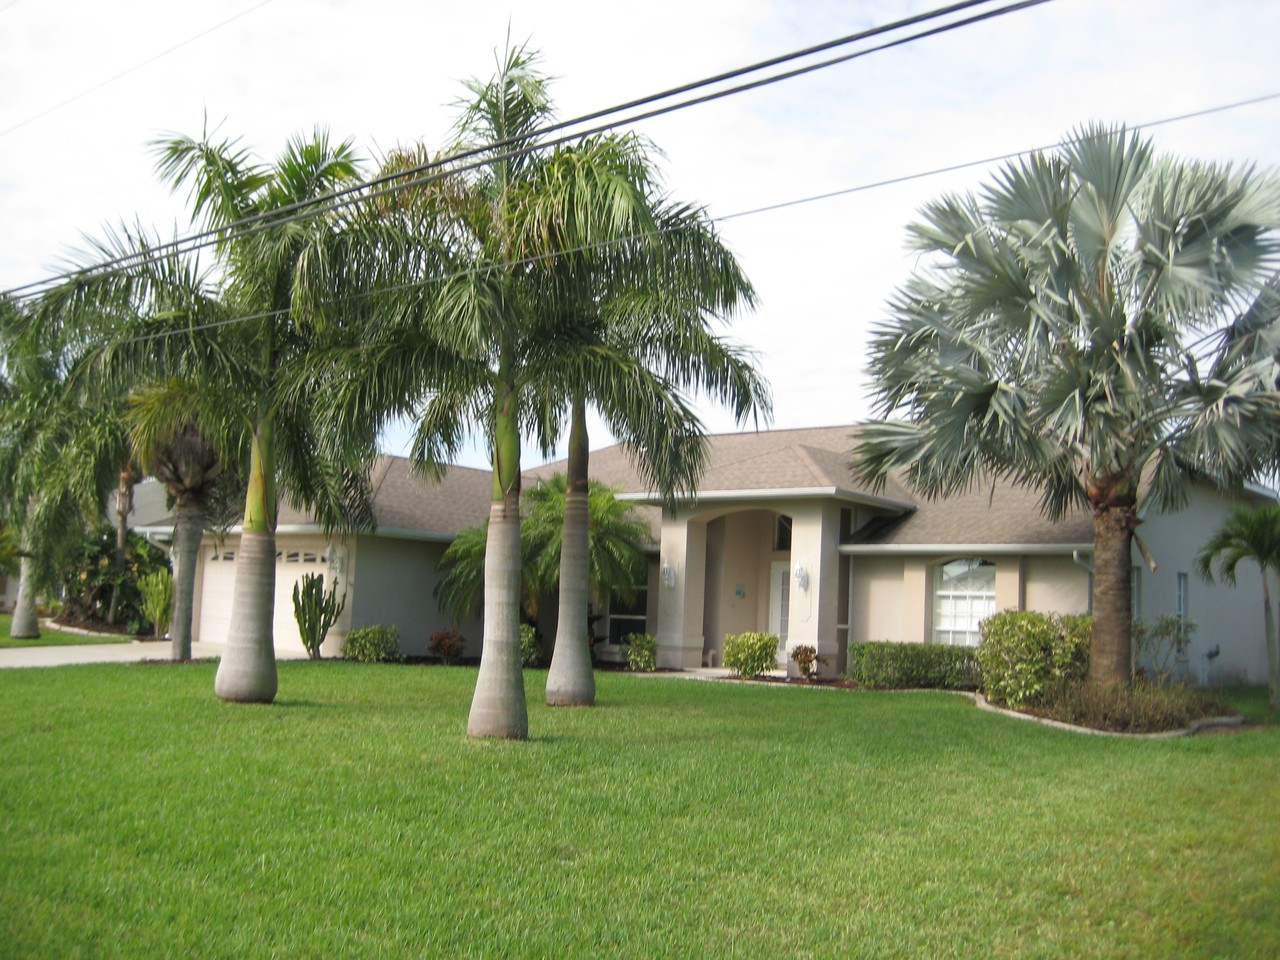 Villa Paradiso Cape Coral, Florida